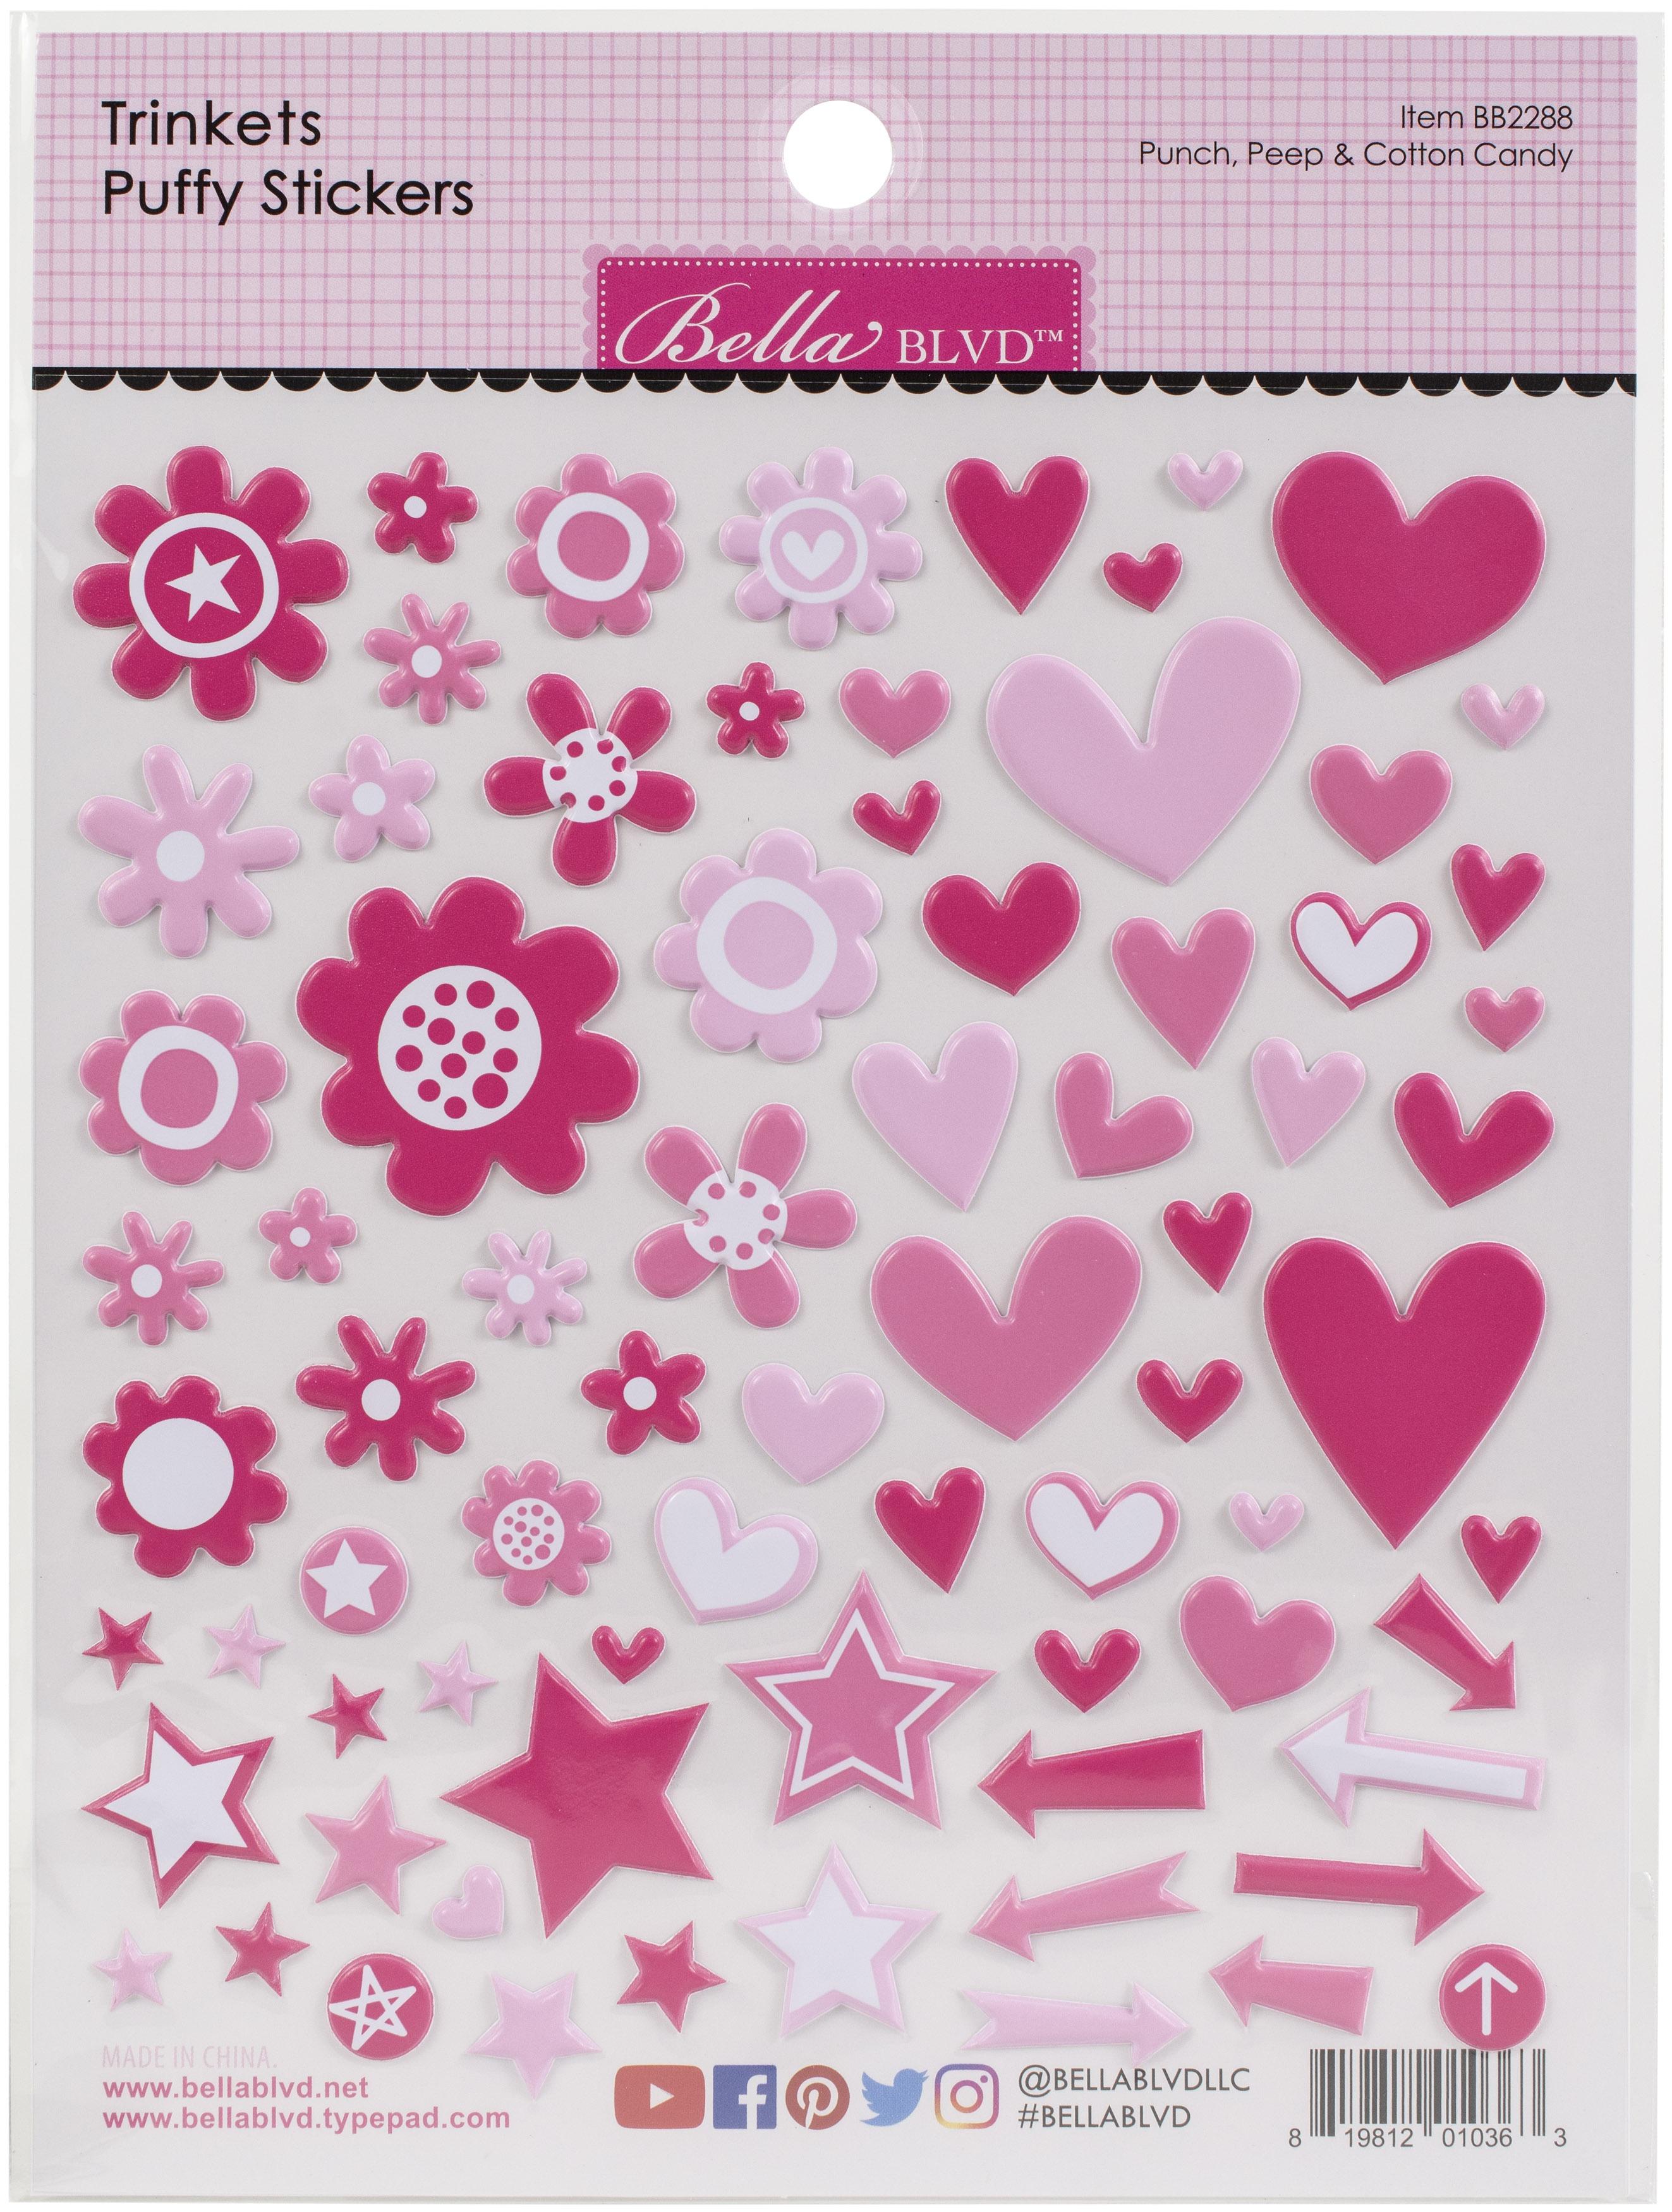 Bella Besties Trinkets Puffy Stickers-Punch, Peep & Cotton Candy